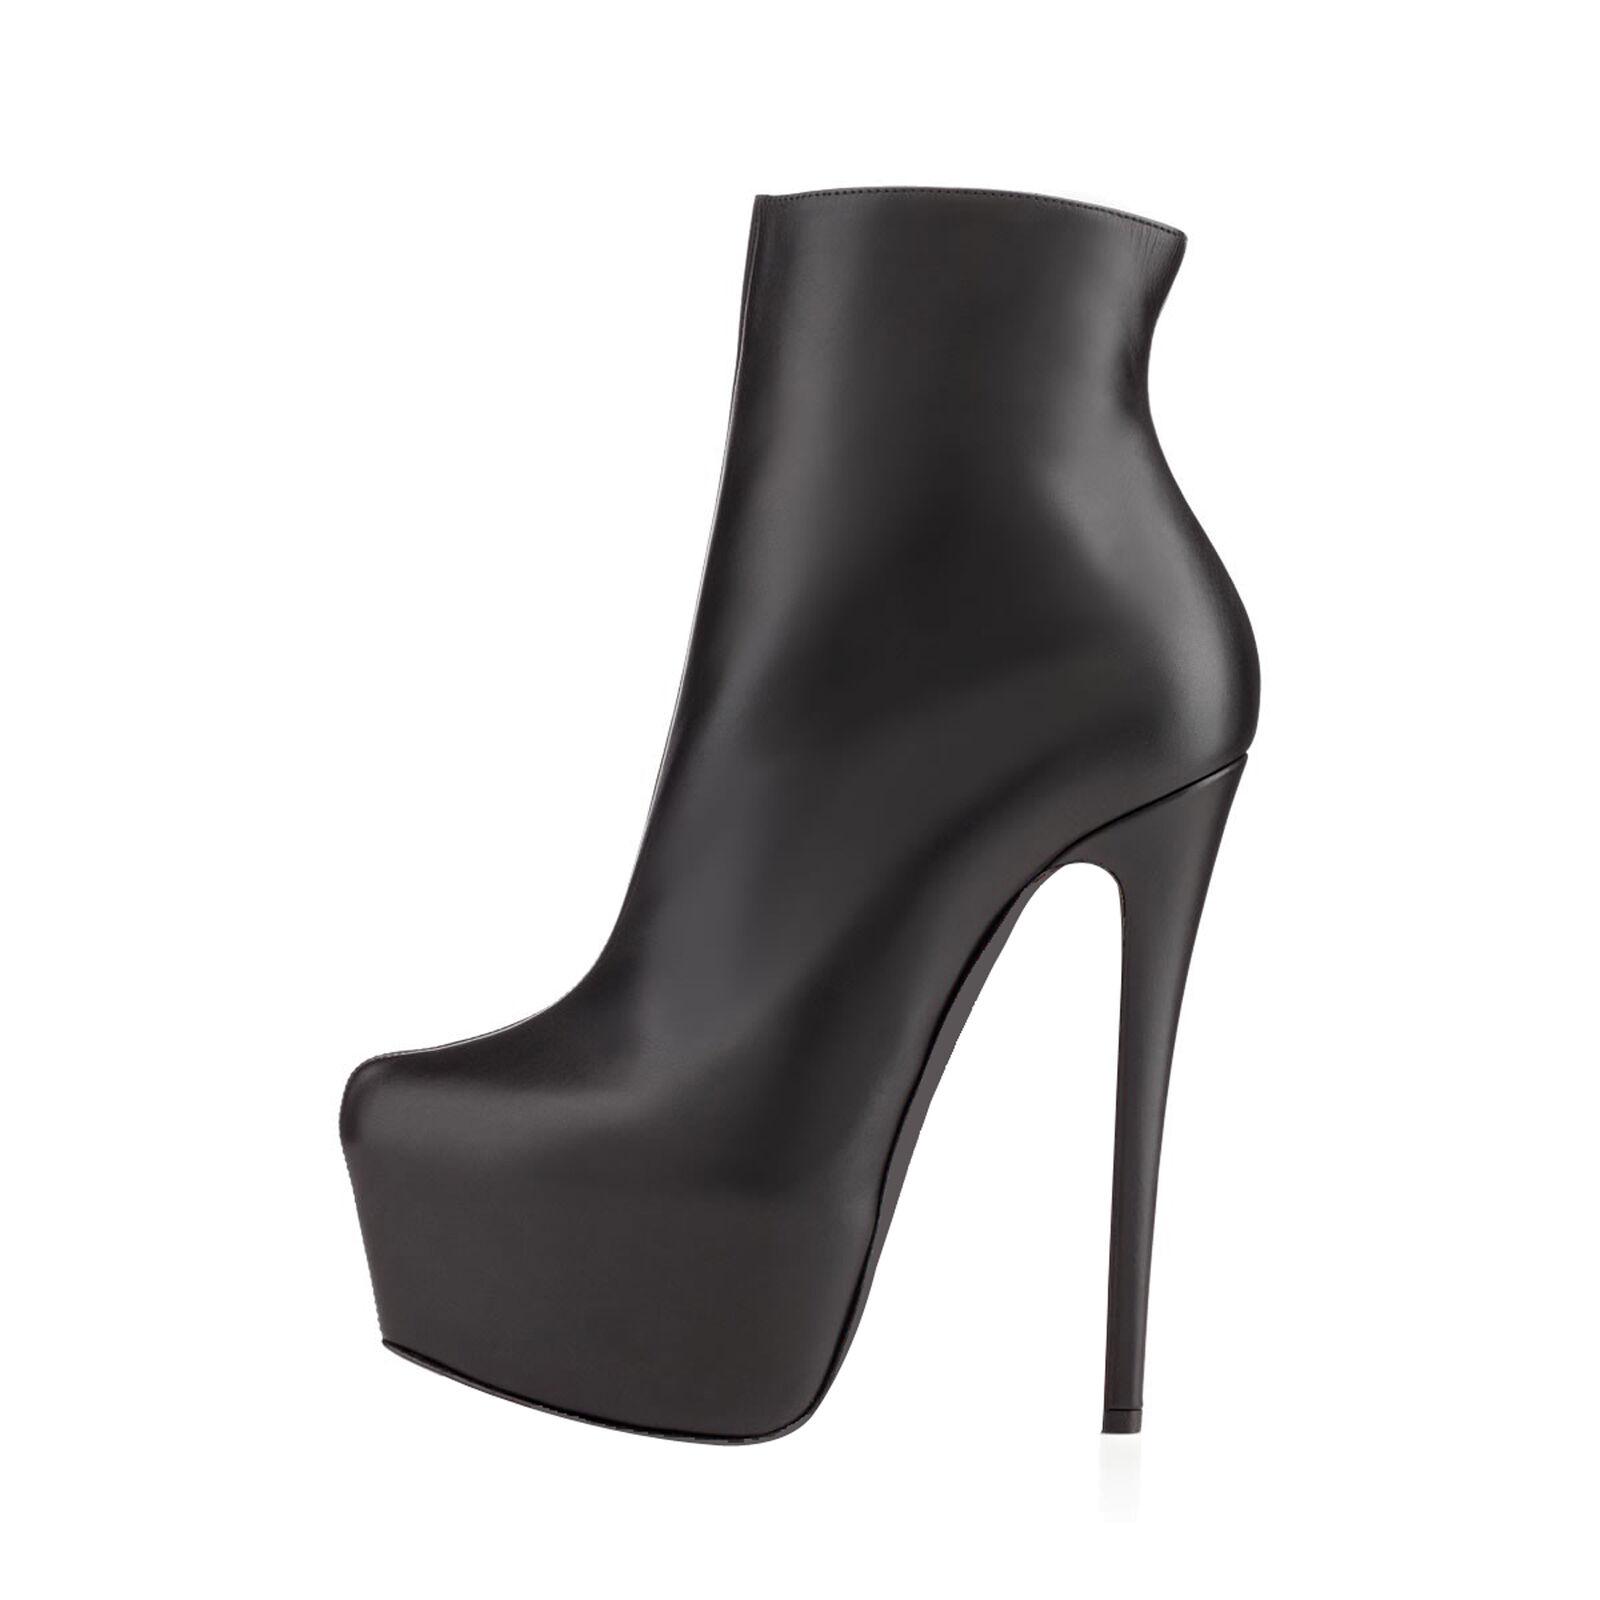 Womens Ankle Riding Boots Stilettos High Heels Platform Solid color Elegant D118